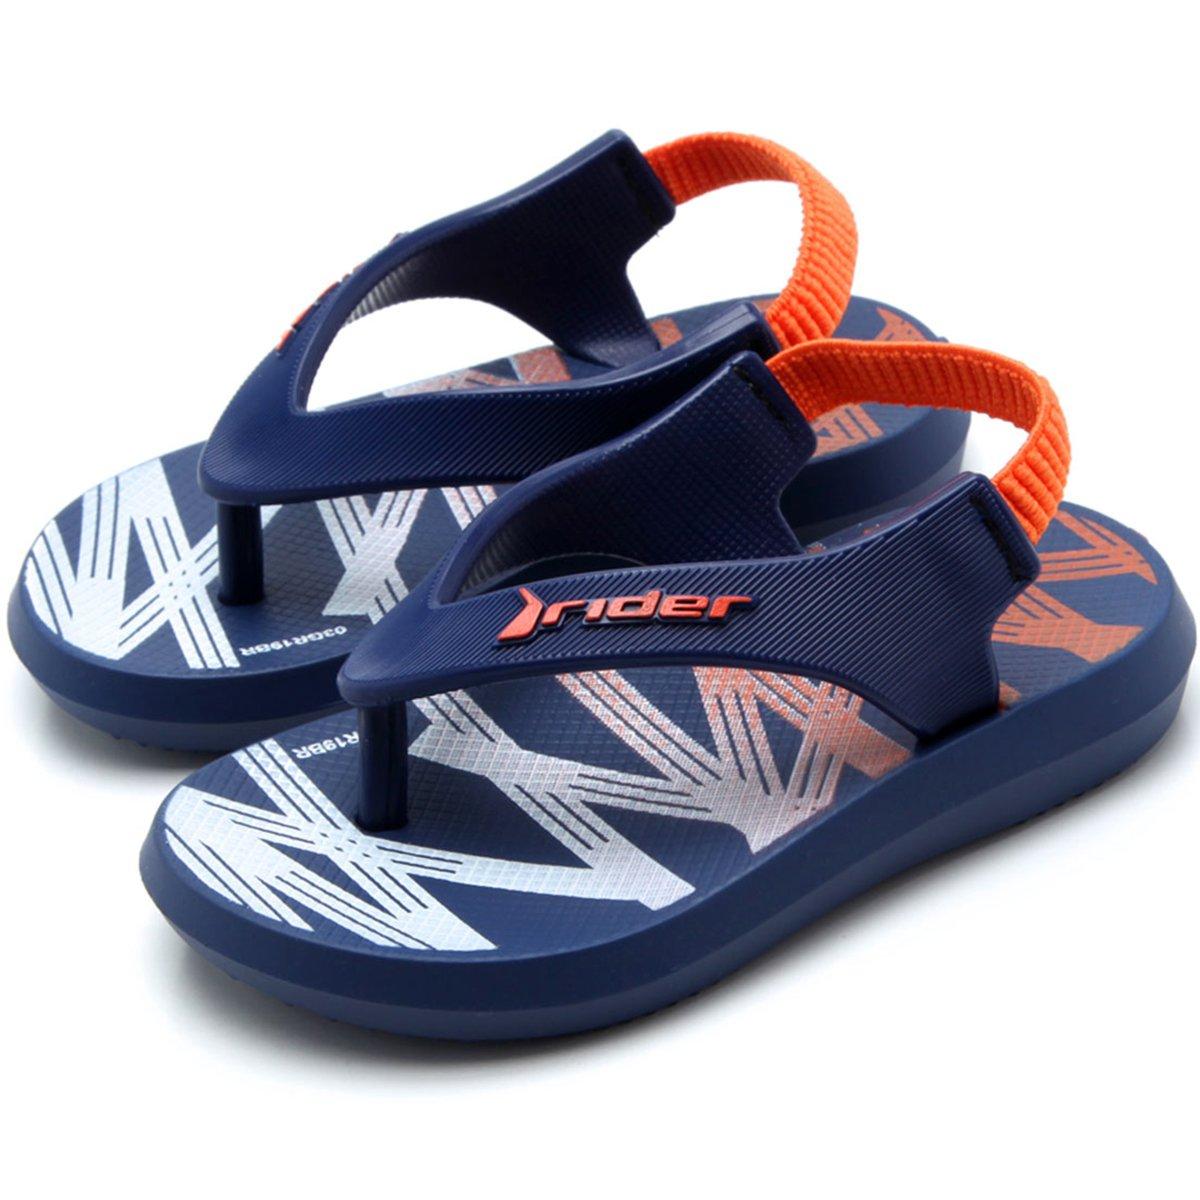 Chinelo Ipanema Infantil Rider R1 Baby - Azul